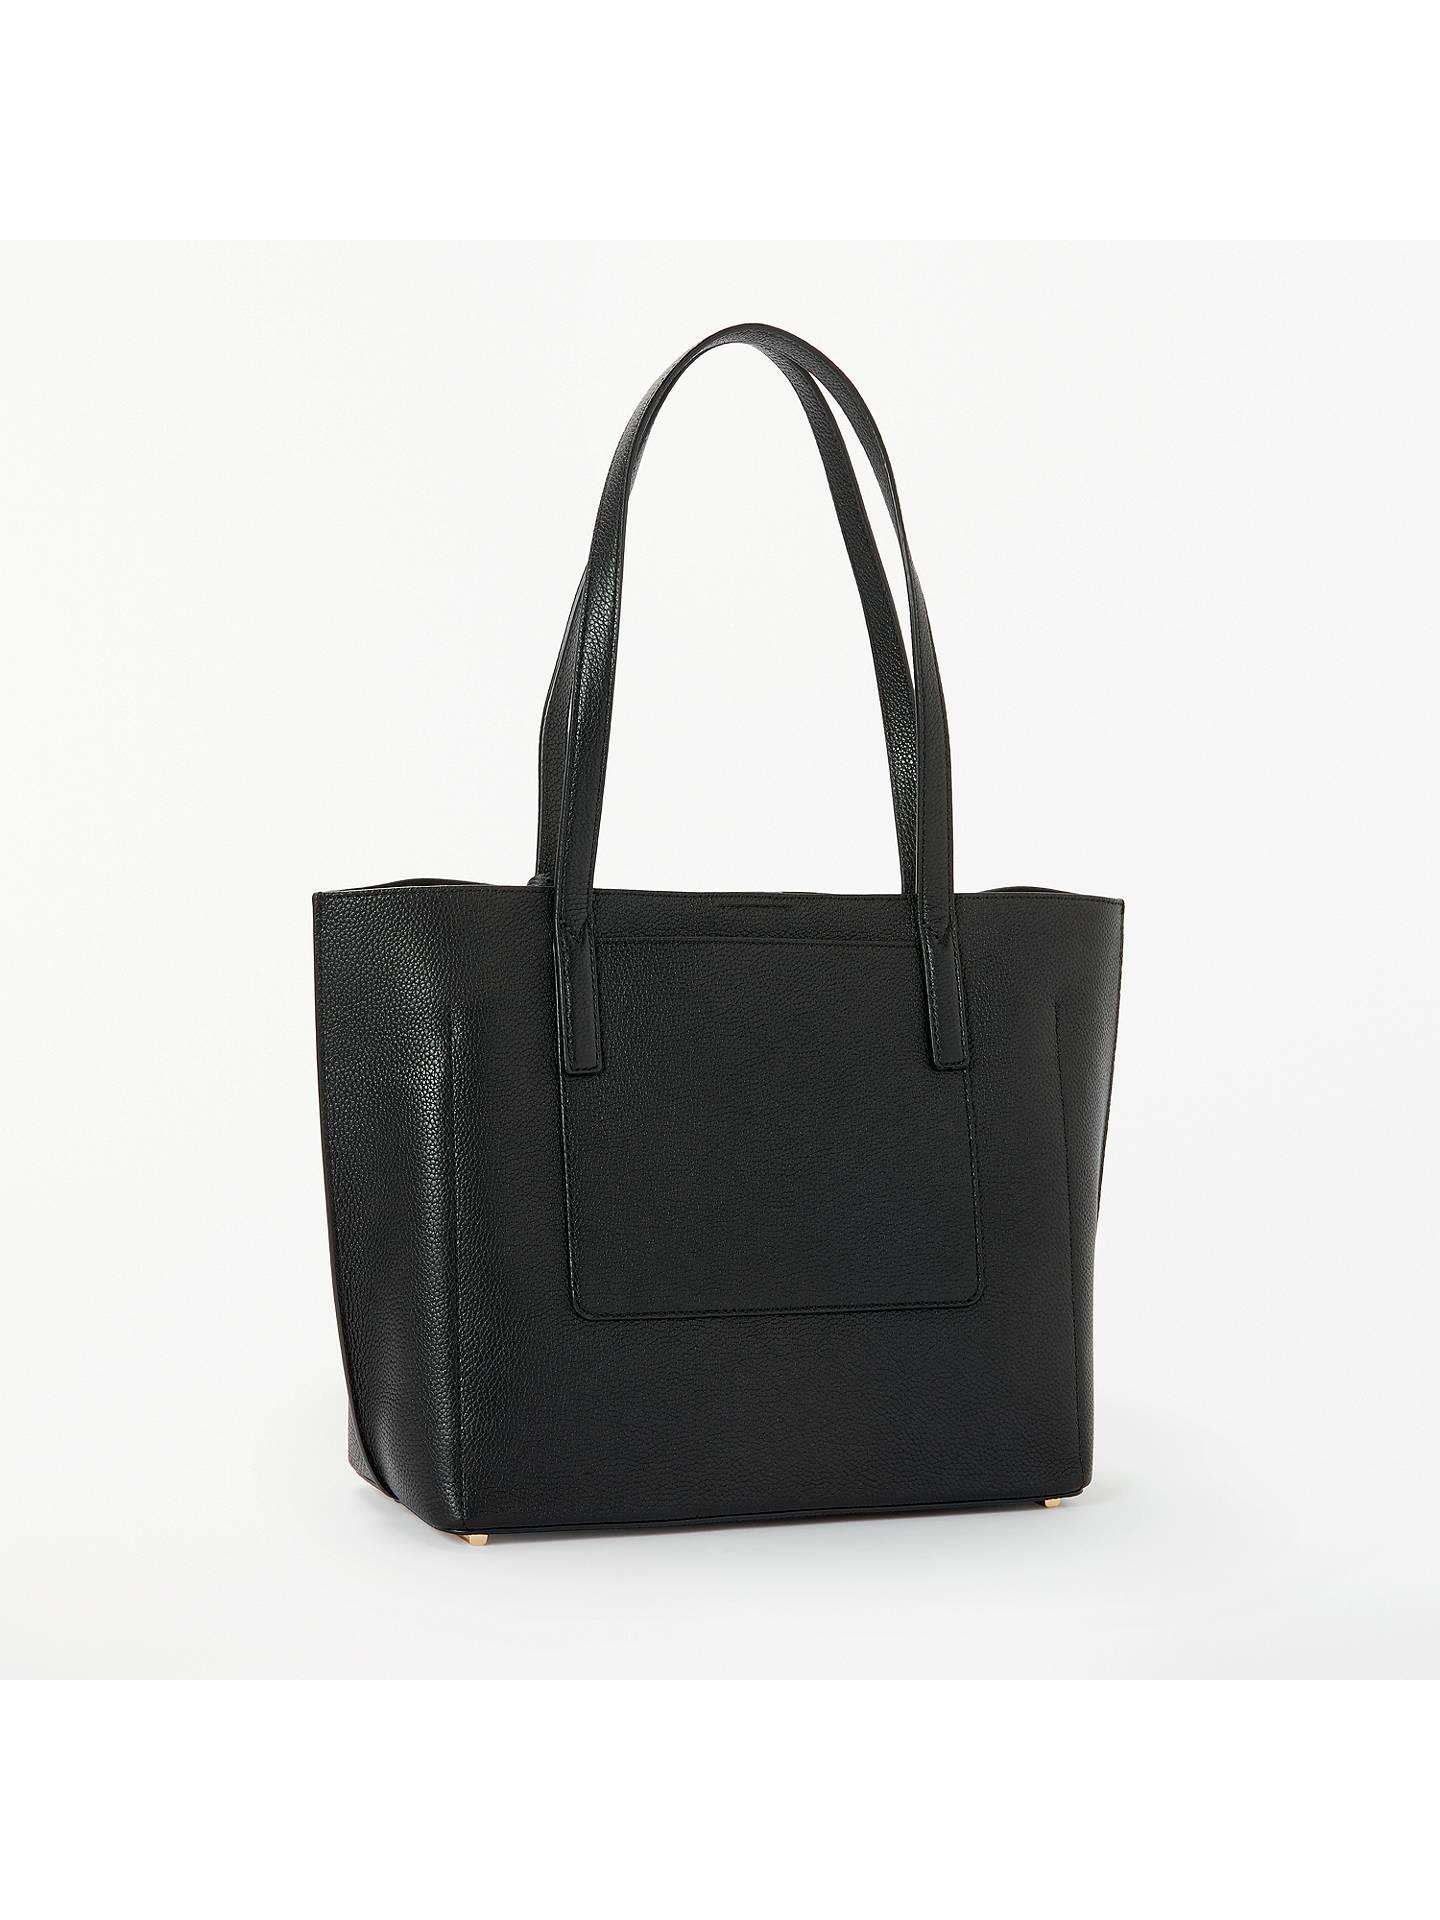 27231863395e ... order buymichael michael kors ana bonded leather tote bag black online  at johnlewis 9aa64 cf261 ...